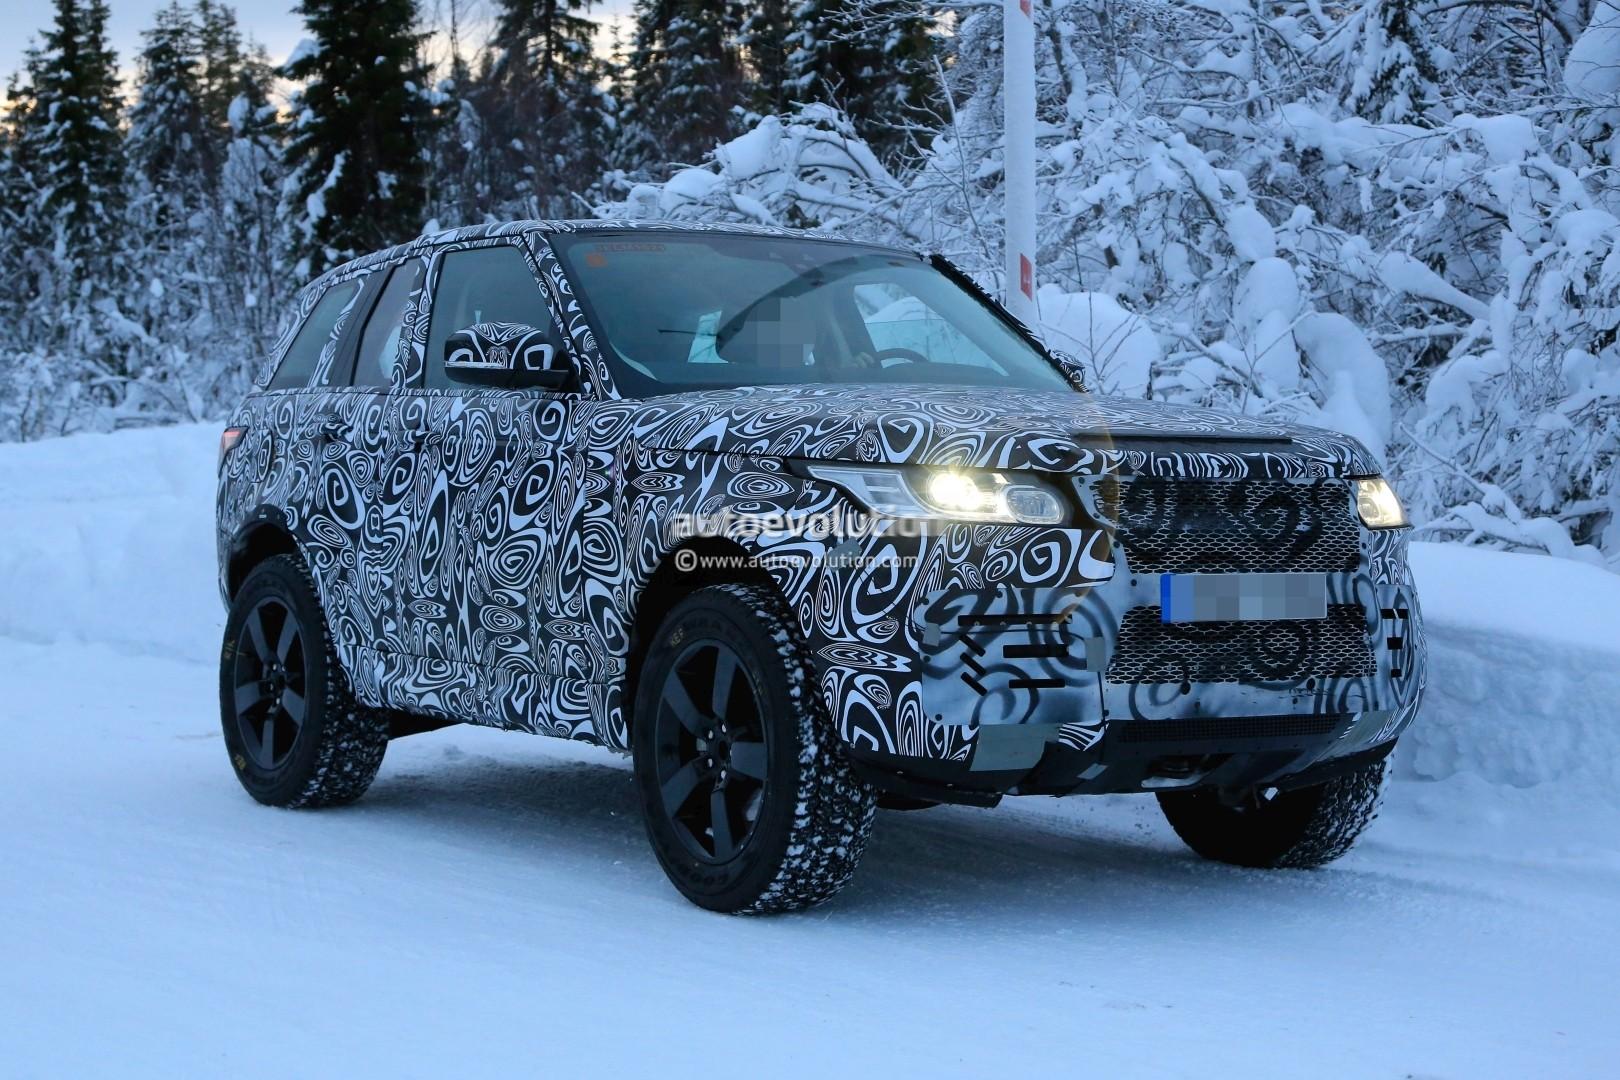 Land Rover Defender Mule >> Spyshots: 2020 Land Rover Defender Makes Debut as Petite Test Mule - autoevolution